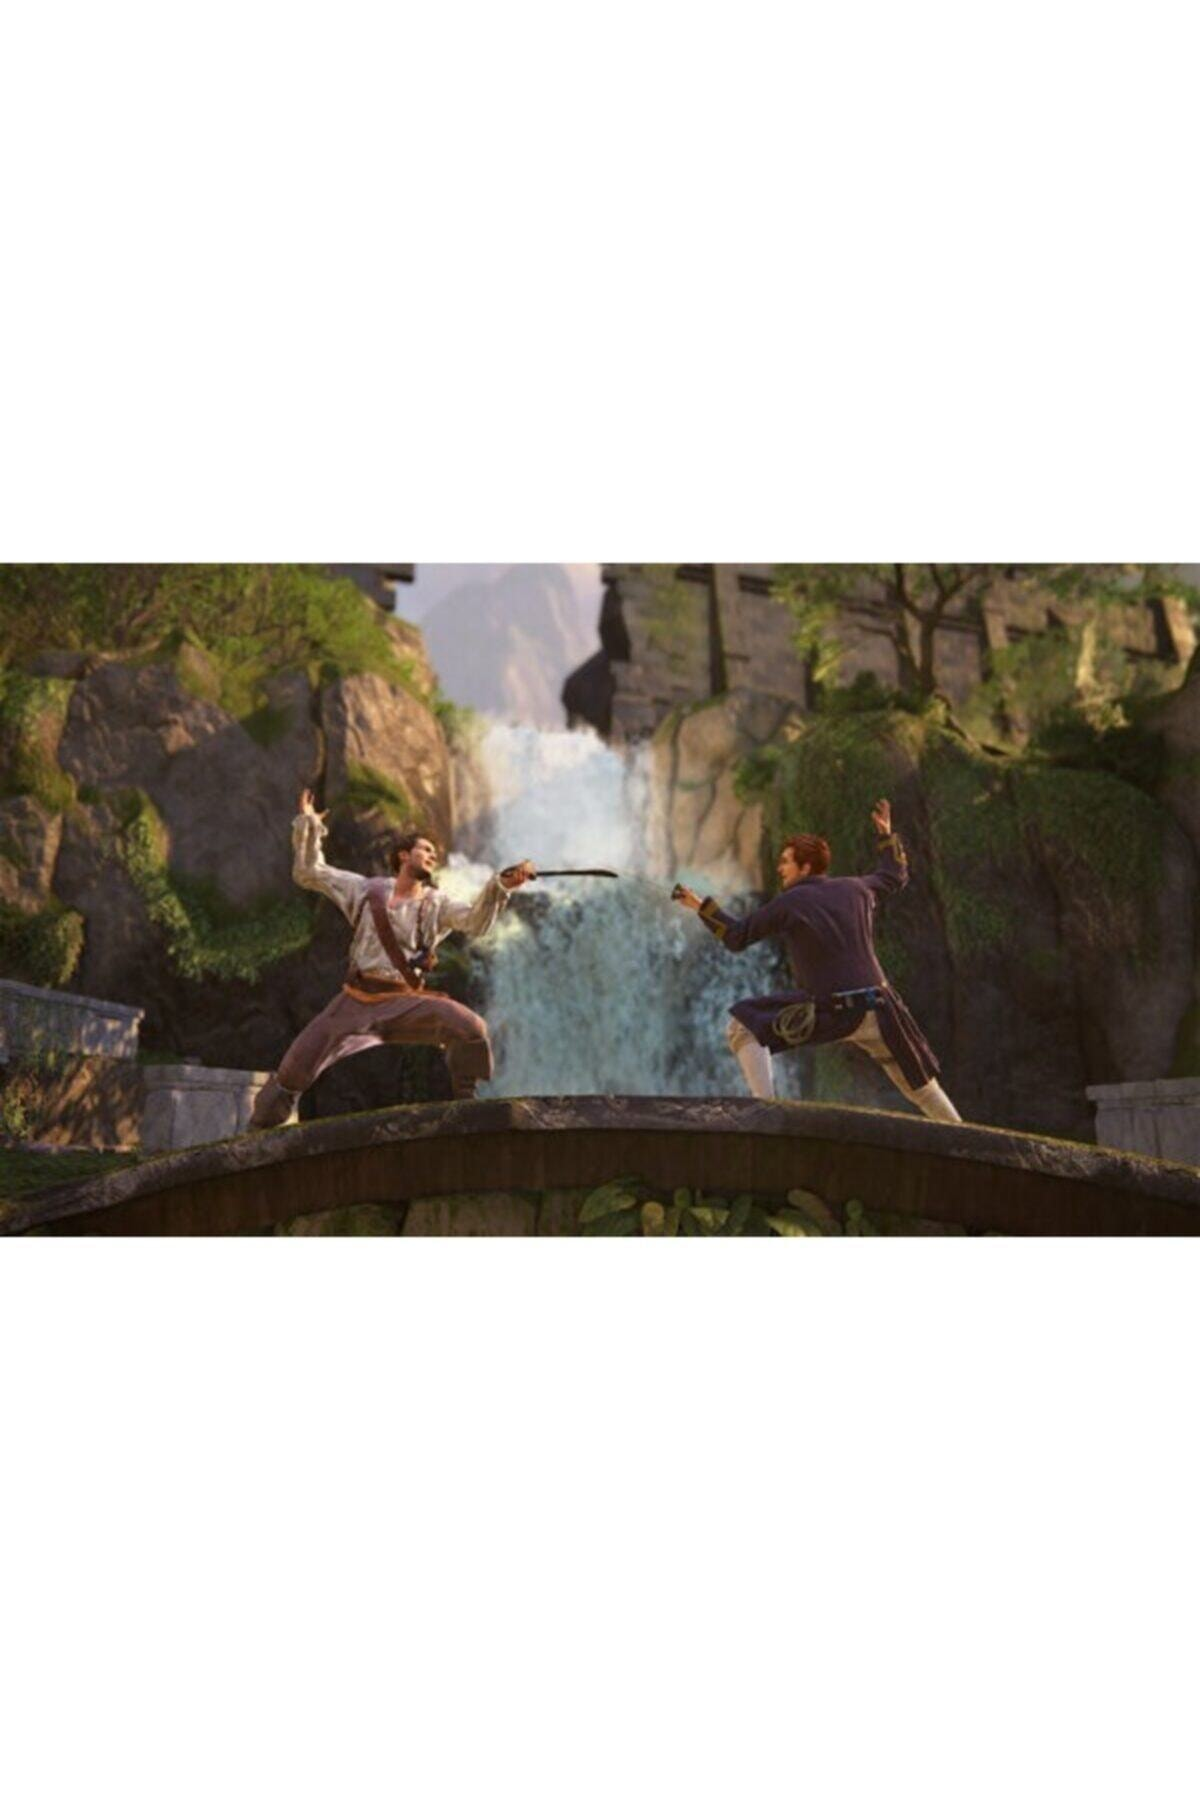 Naughty Dog Ps4 Uncharted 4- Orjinal Oyun - Sıfır Jelatin 2